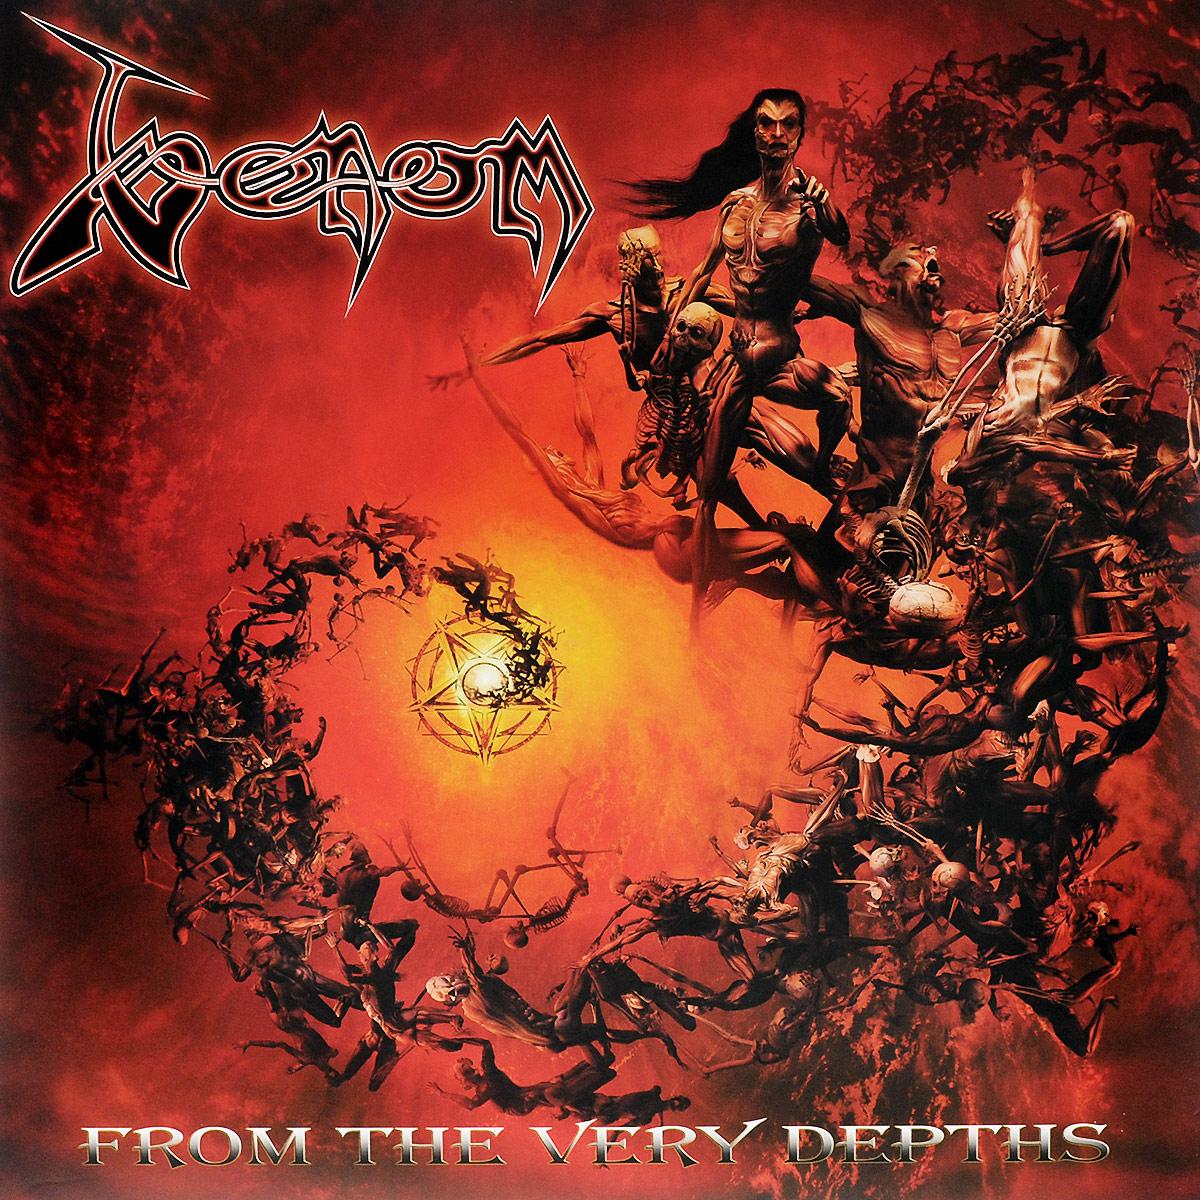 Venom Venom. From The Very Depths (2 LP) venom venom welcome to hell 2 lp 180 gr